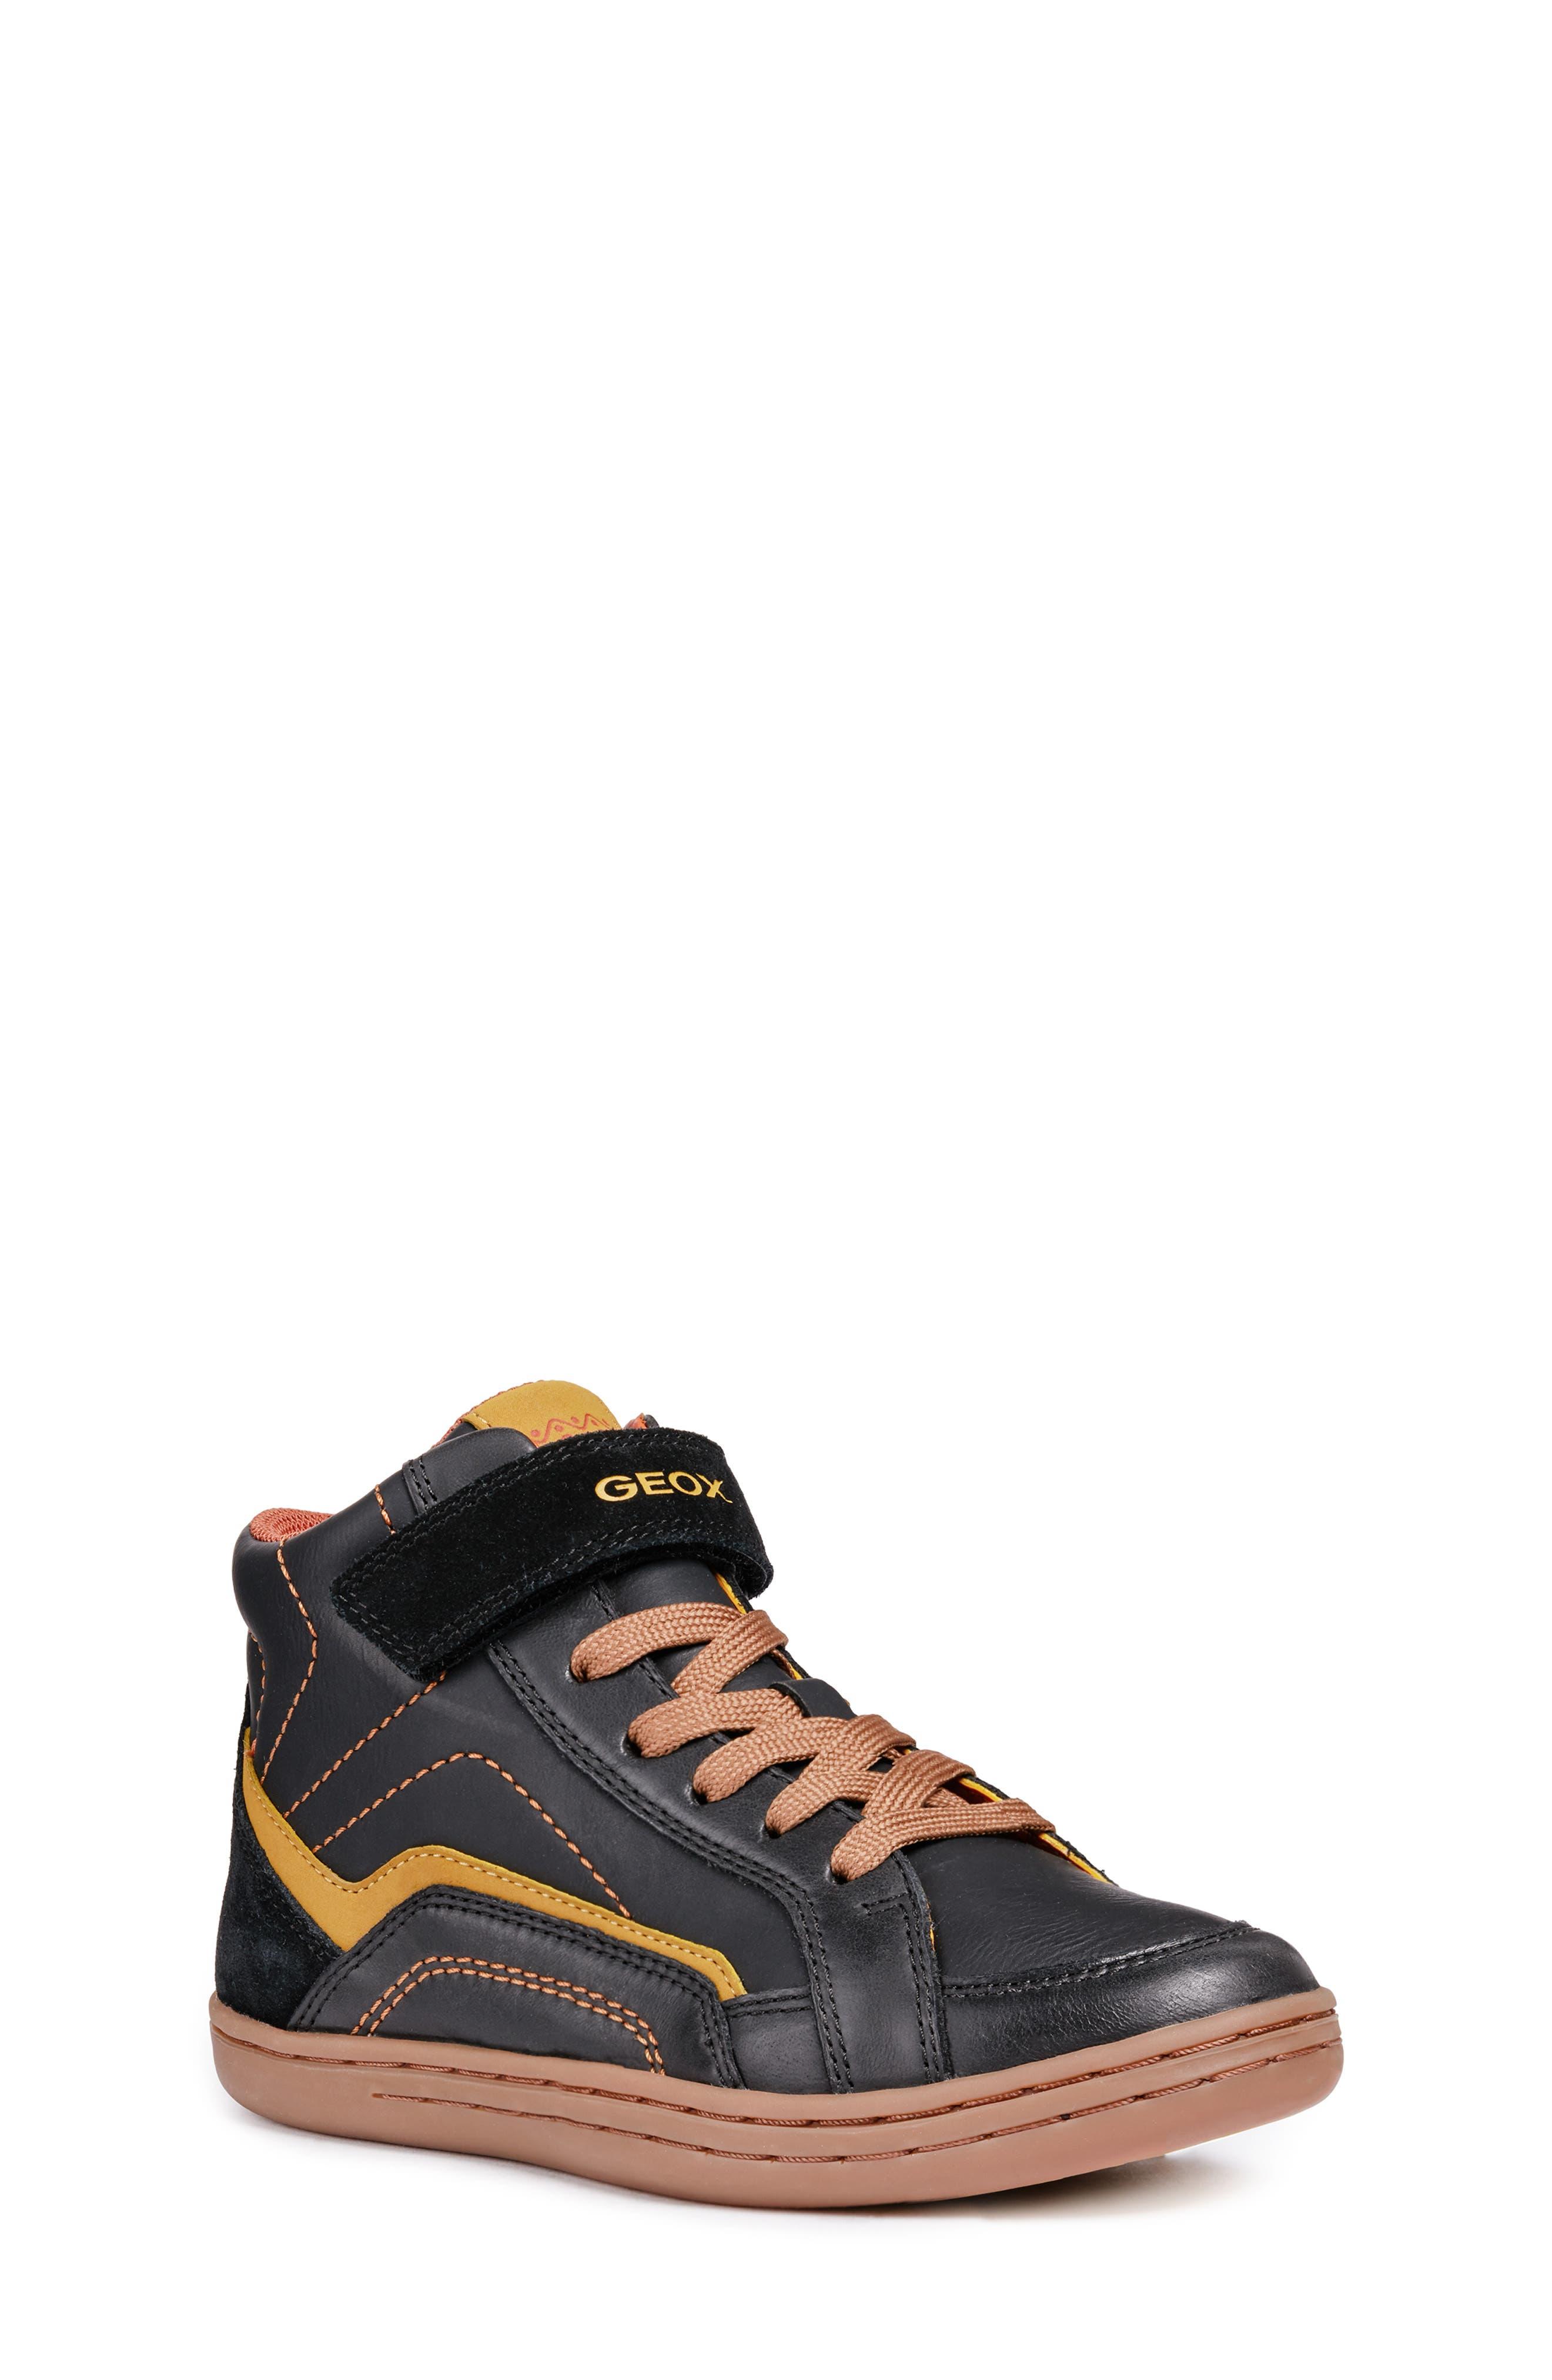 Garcia Mid Sneaker,                             Main thumbnail 1, color,                             BLACK/ DARK YELLOW